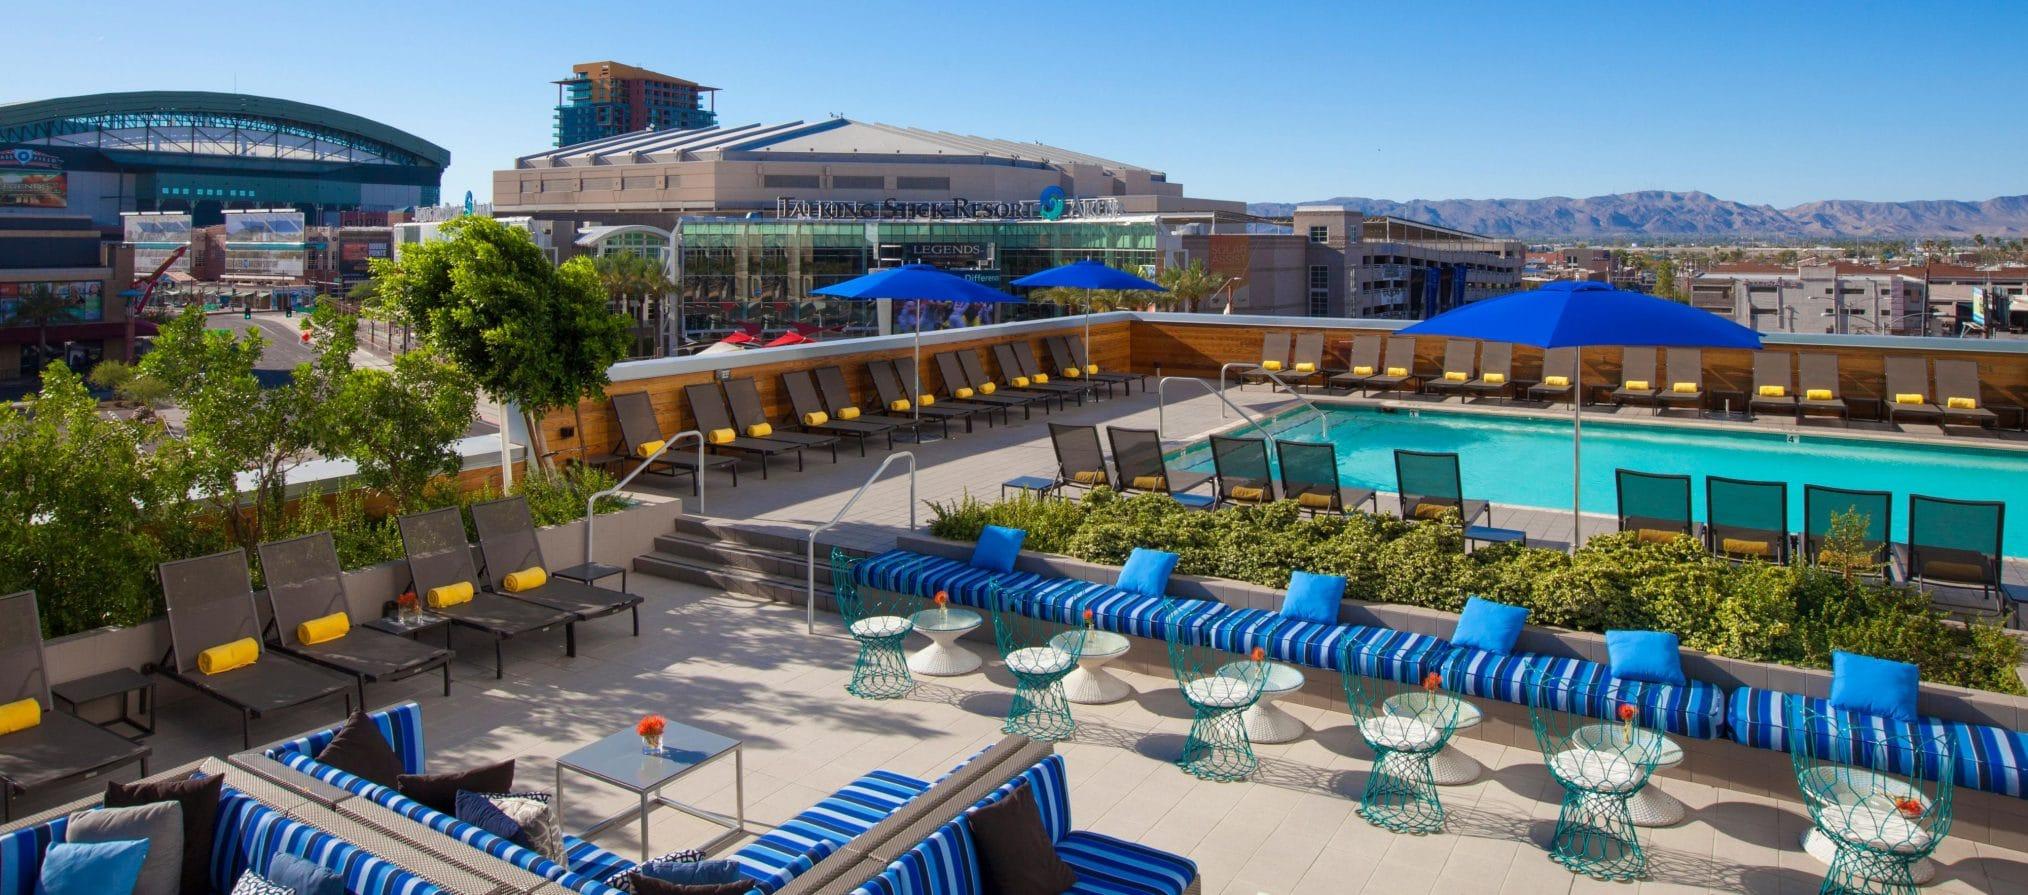 The Kimpton Hotel Palomar Phoenix Cityscape